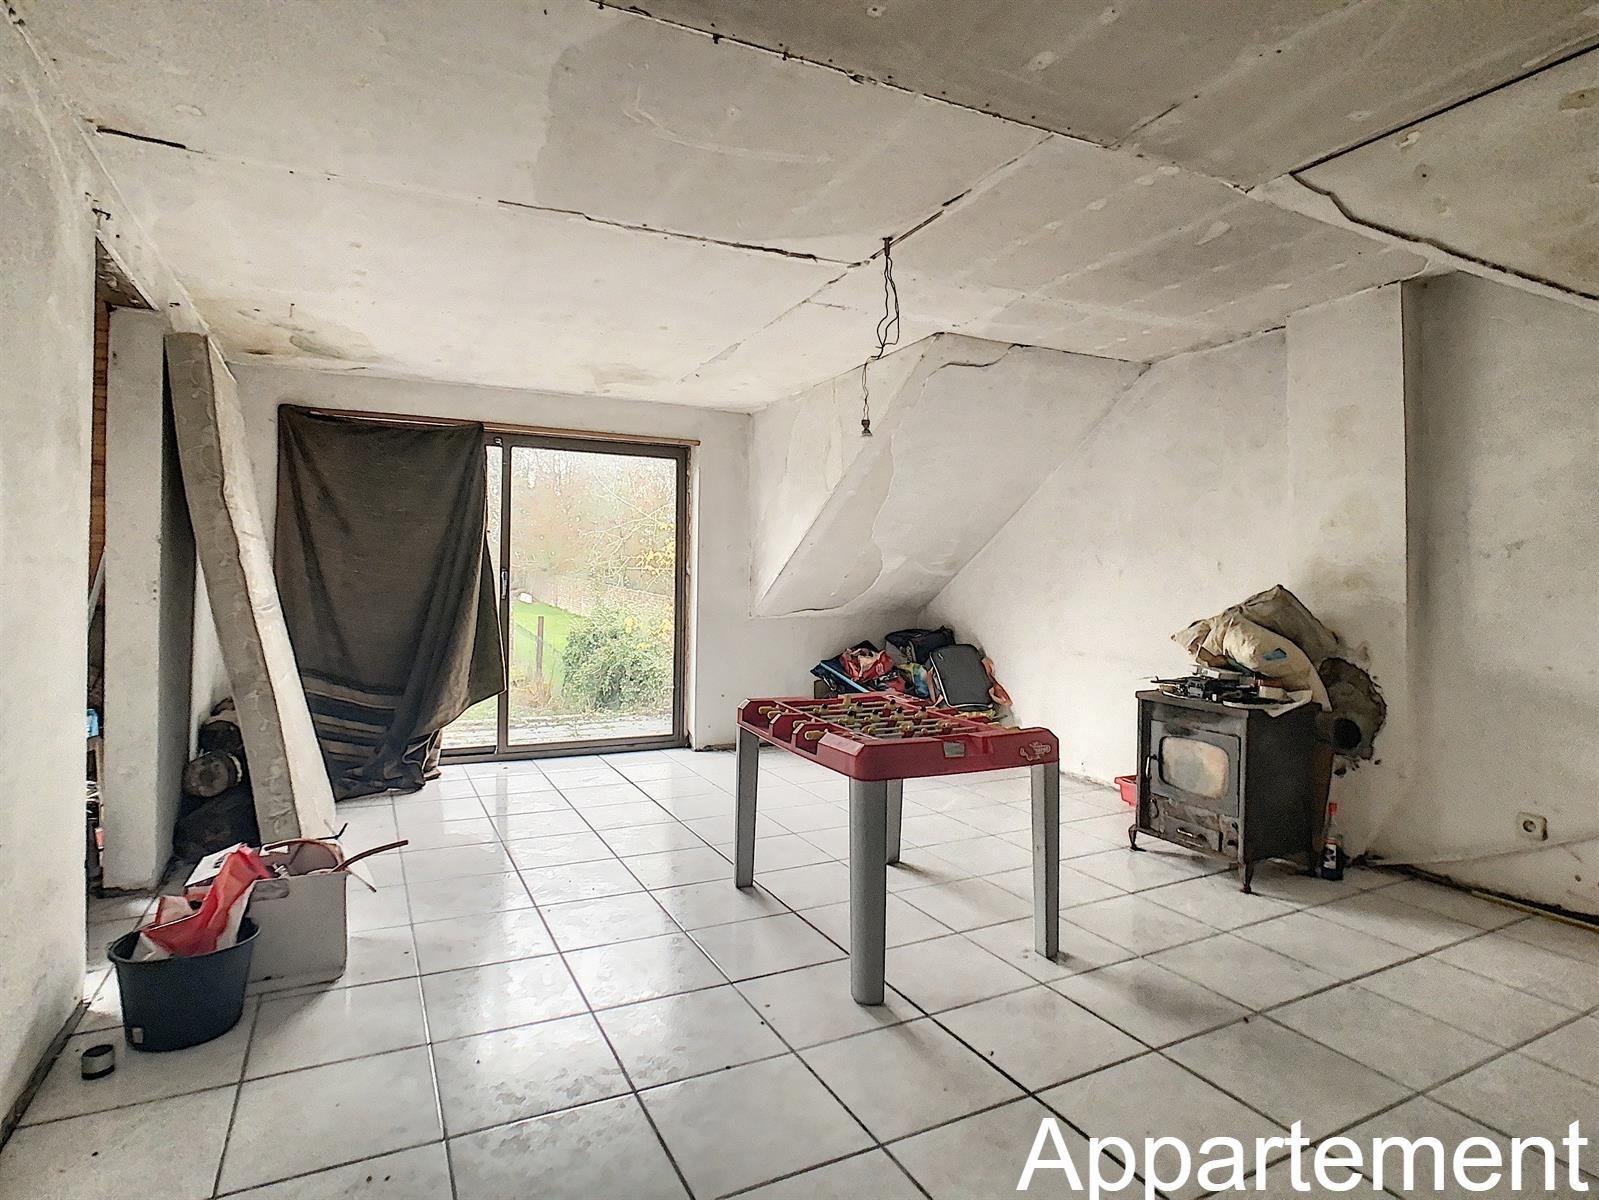 Maison - Villersla-Ville Marbais - #4407538-25